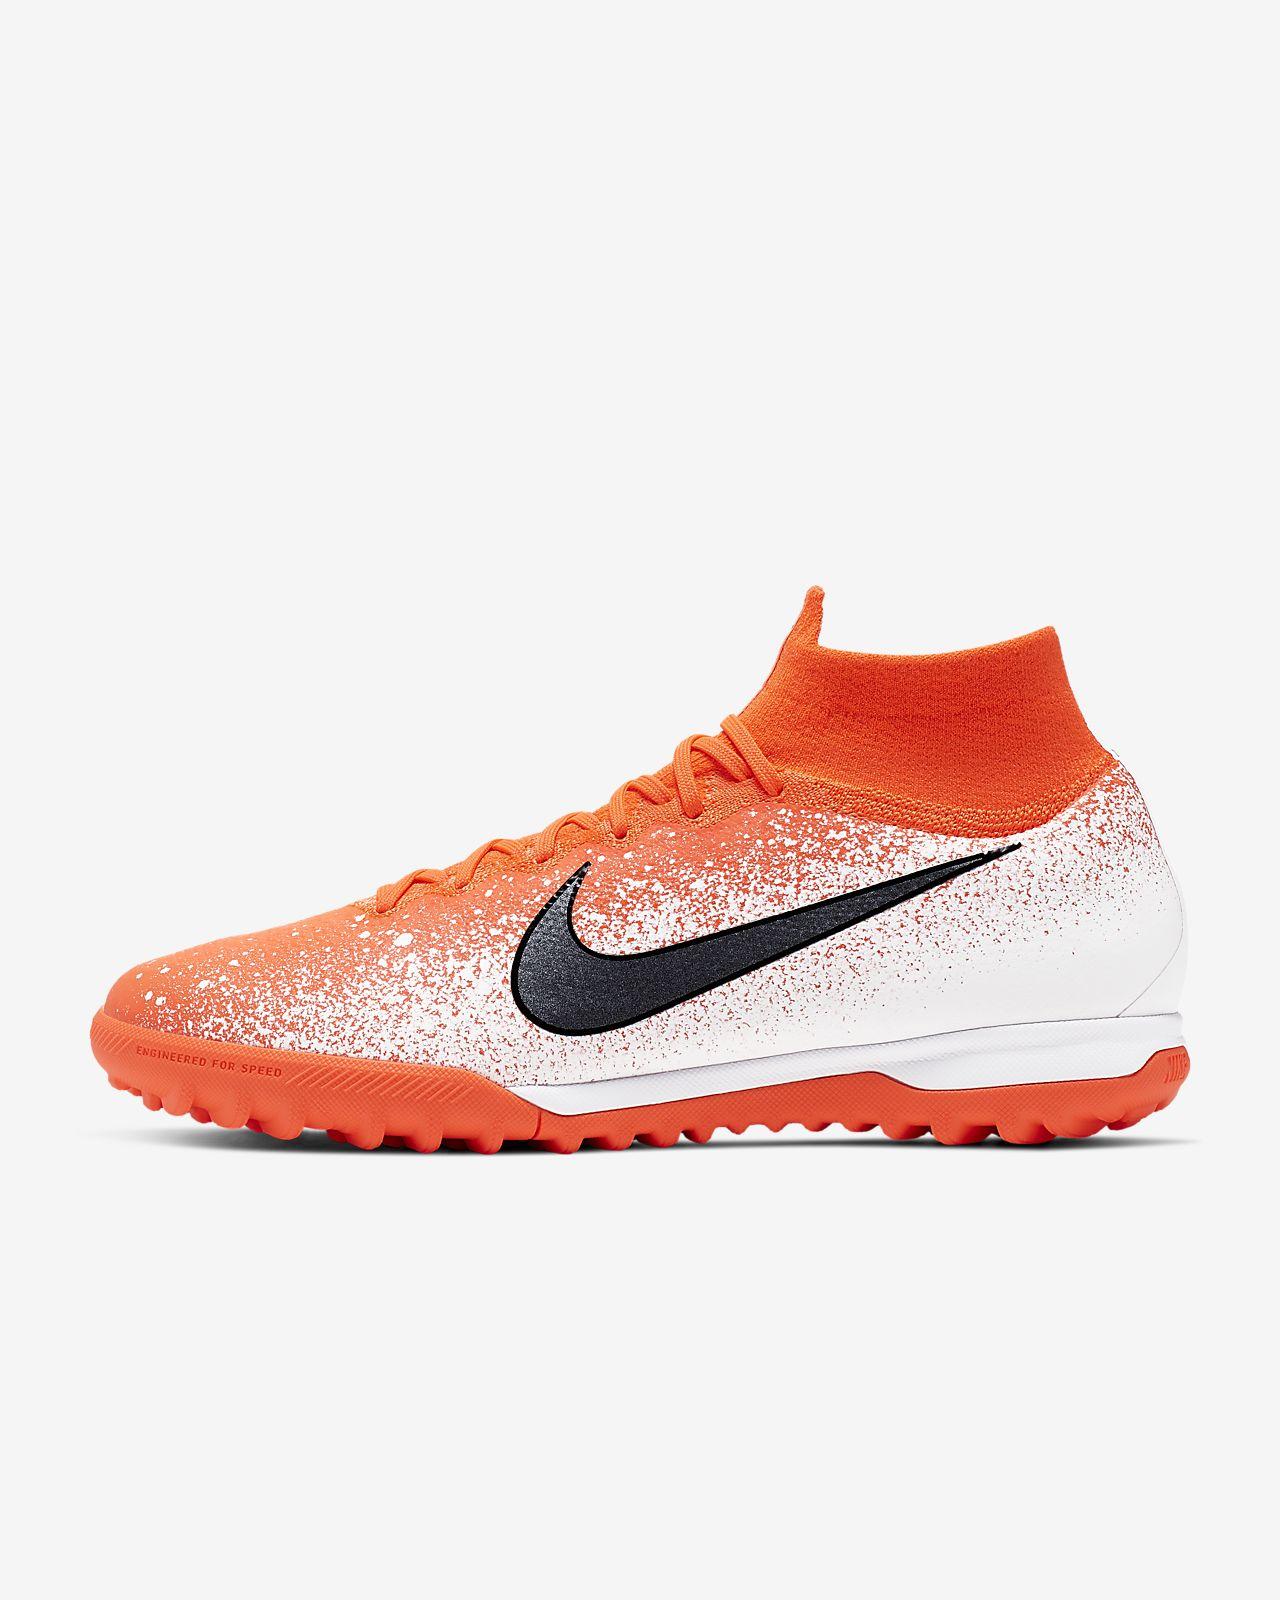 Fotbollssko för grus/turf Nike SuperflyX 6 Elite TF